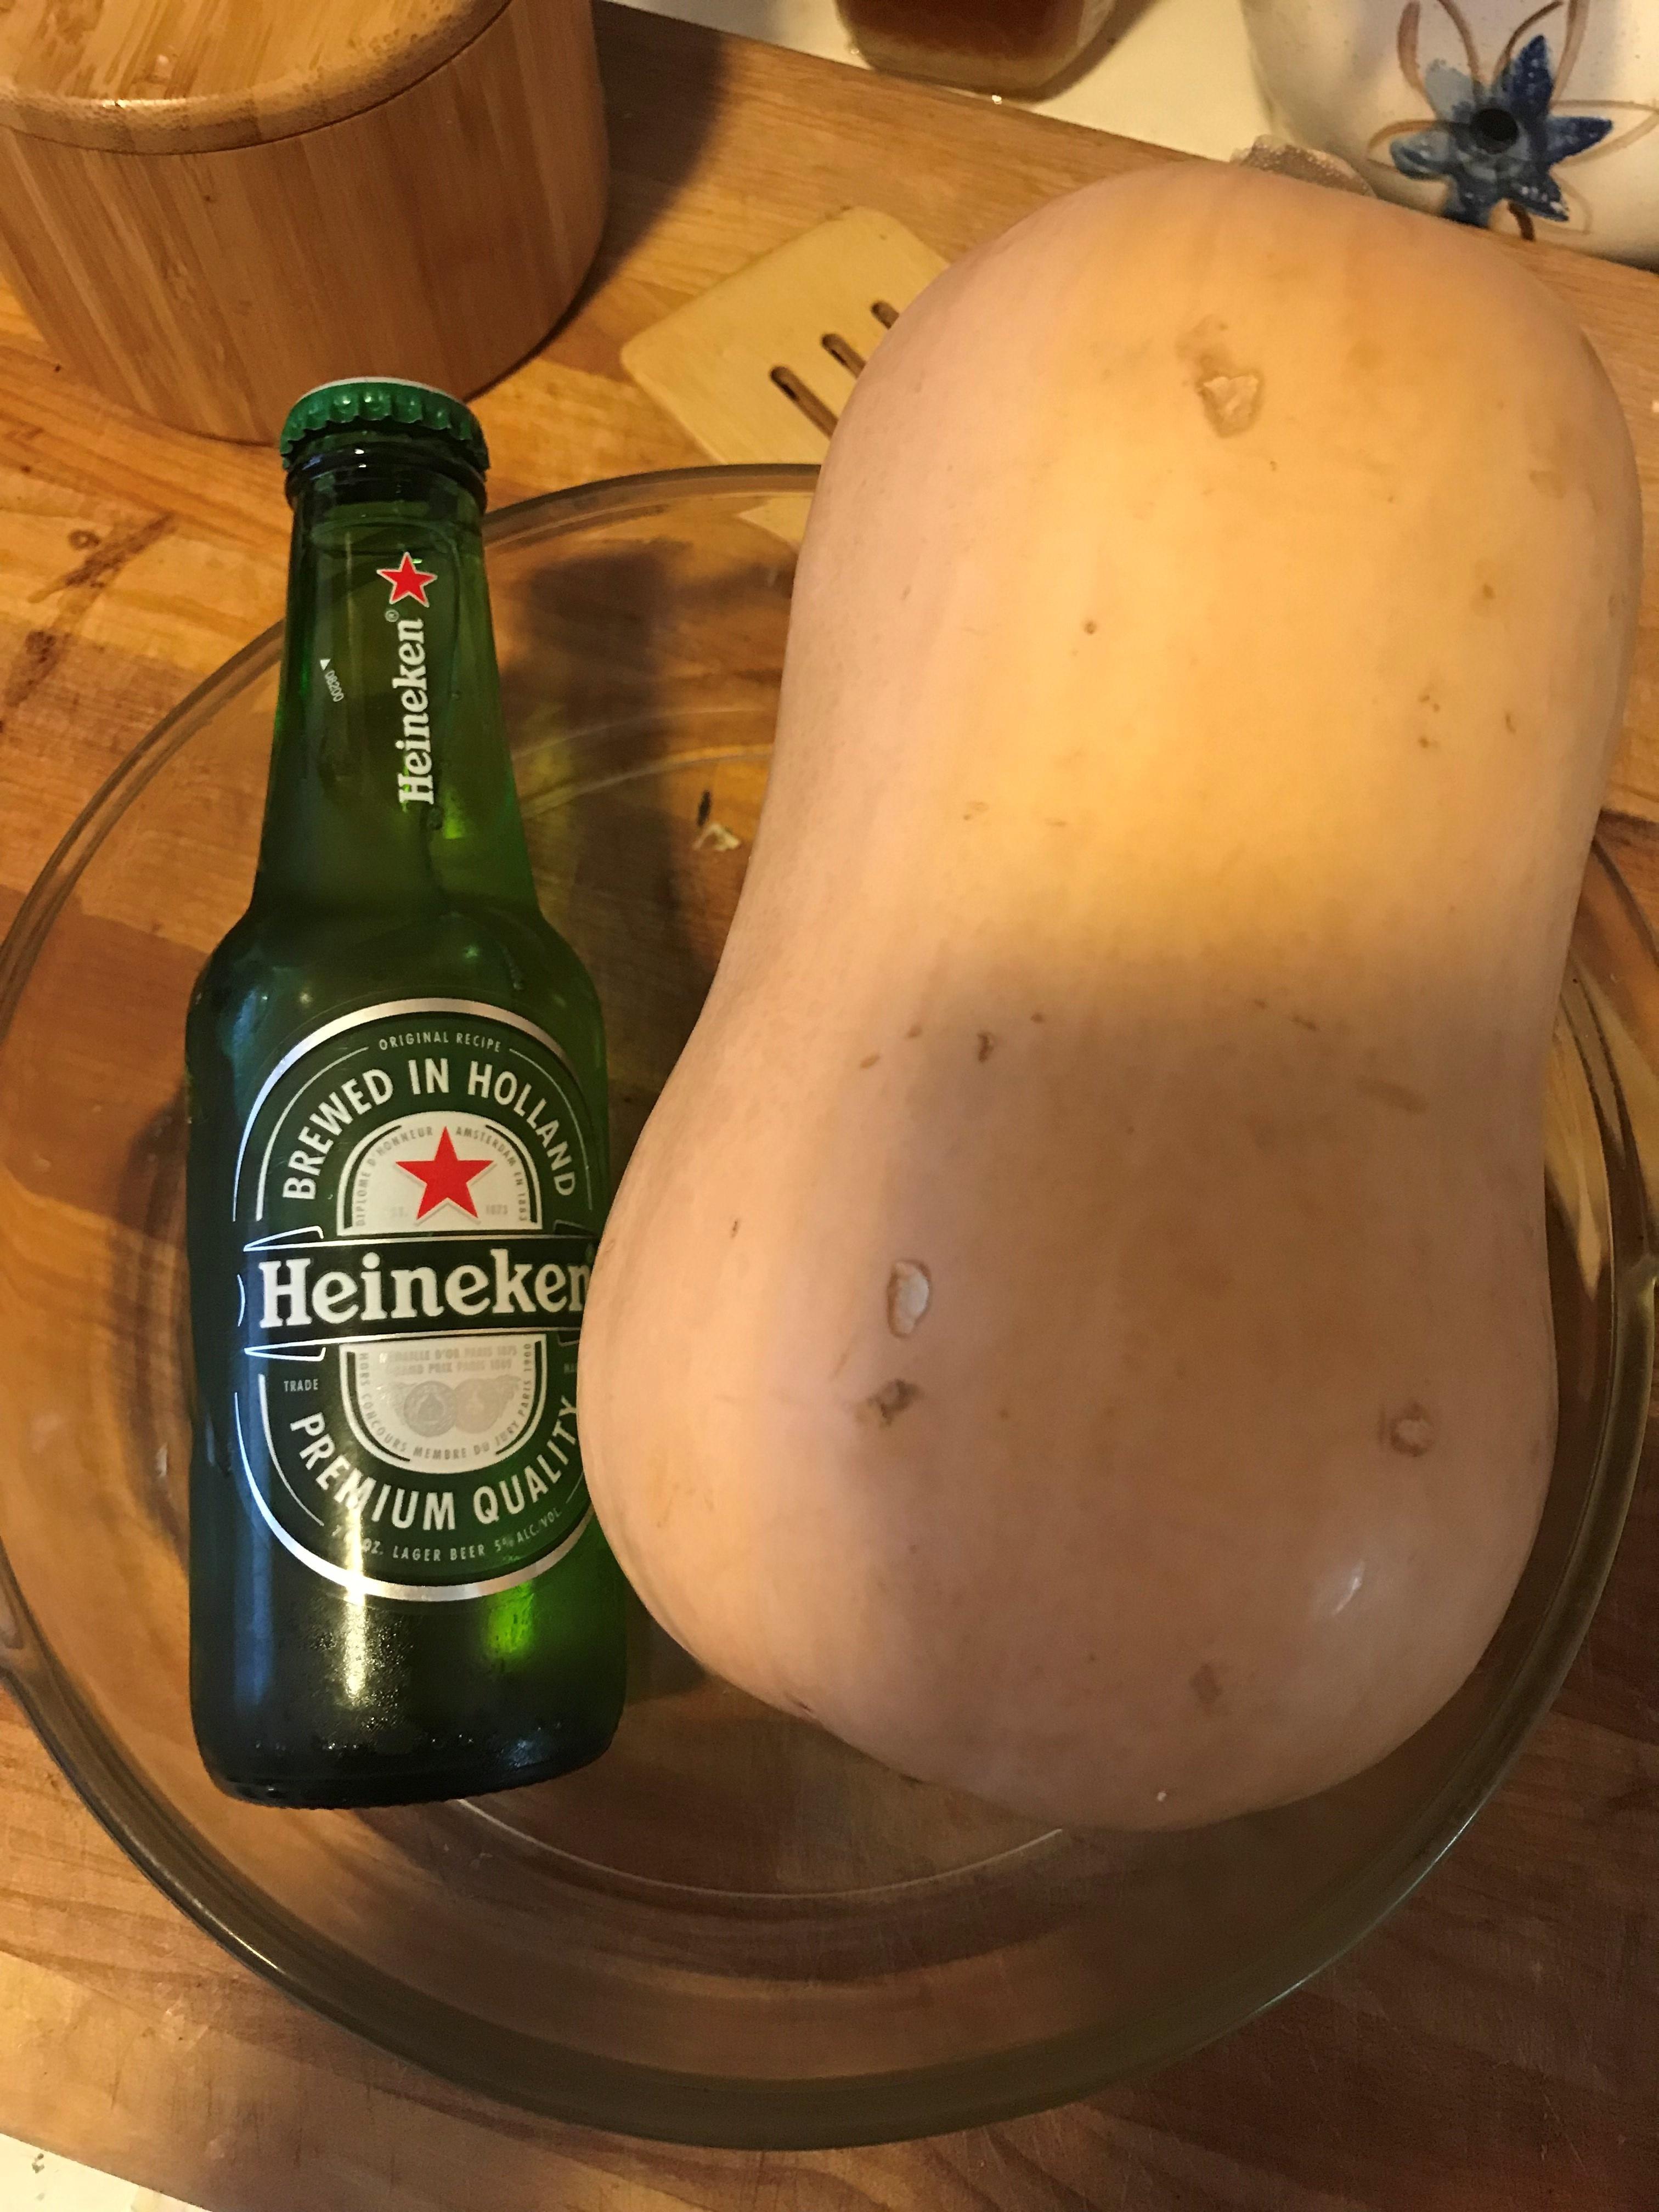 squash beer